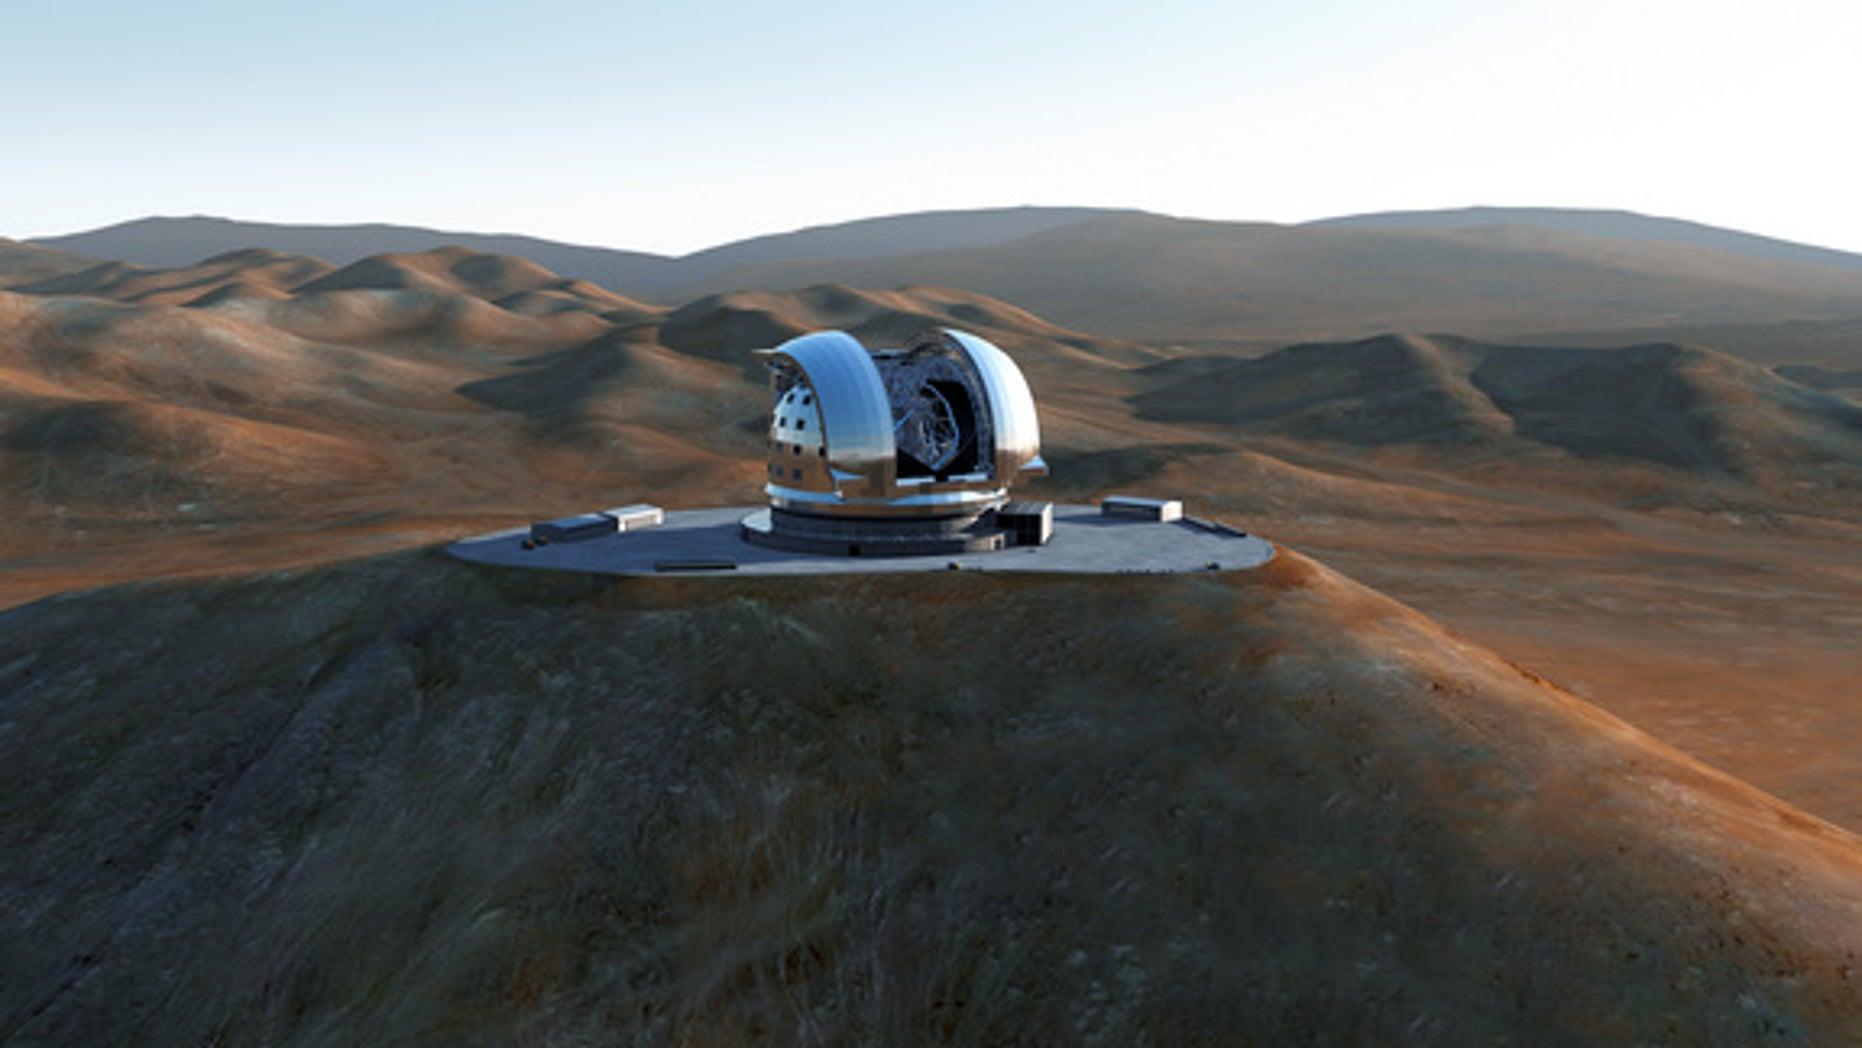 Artist's impression of the European Extremely Large Telescope (E-ELT).